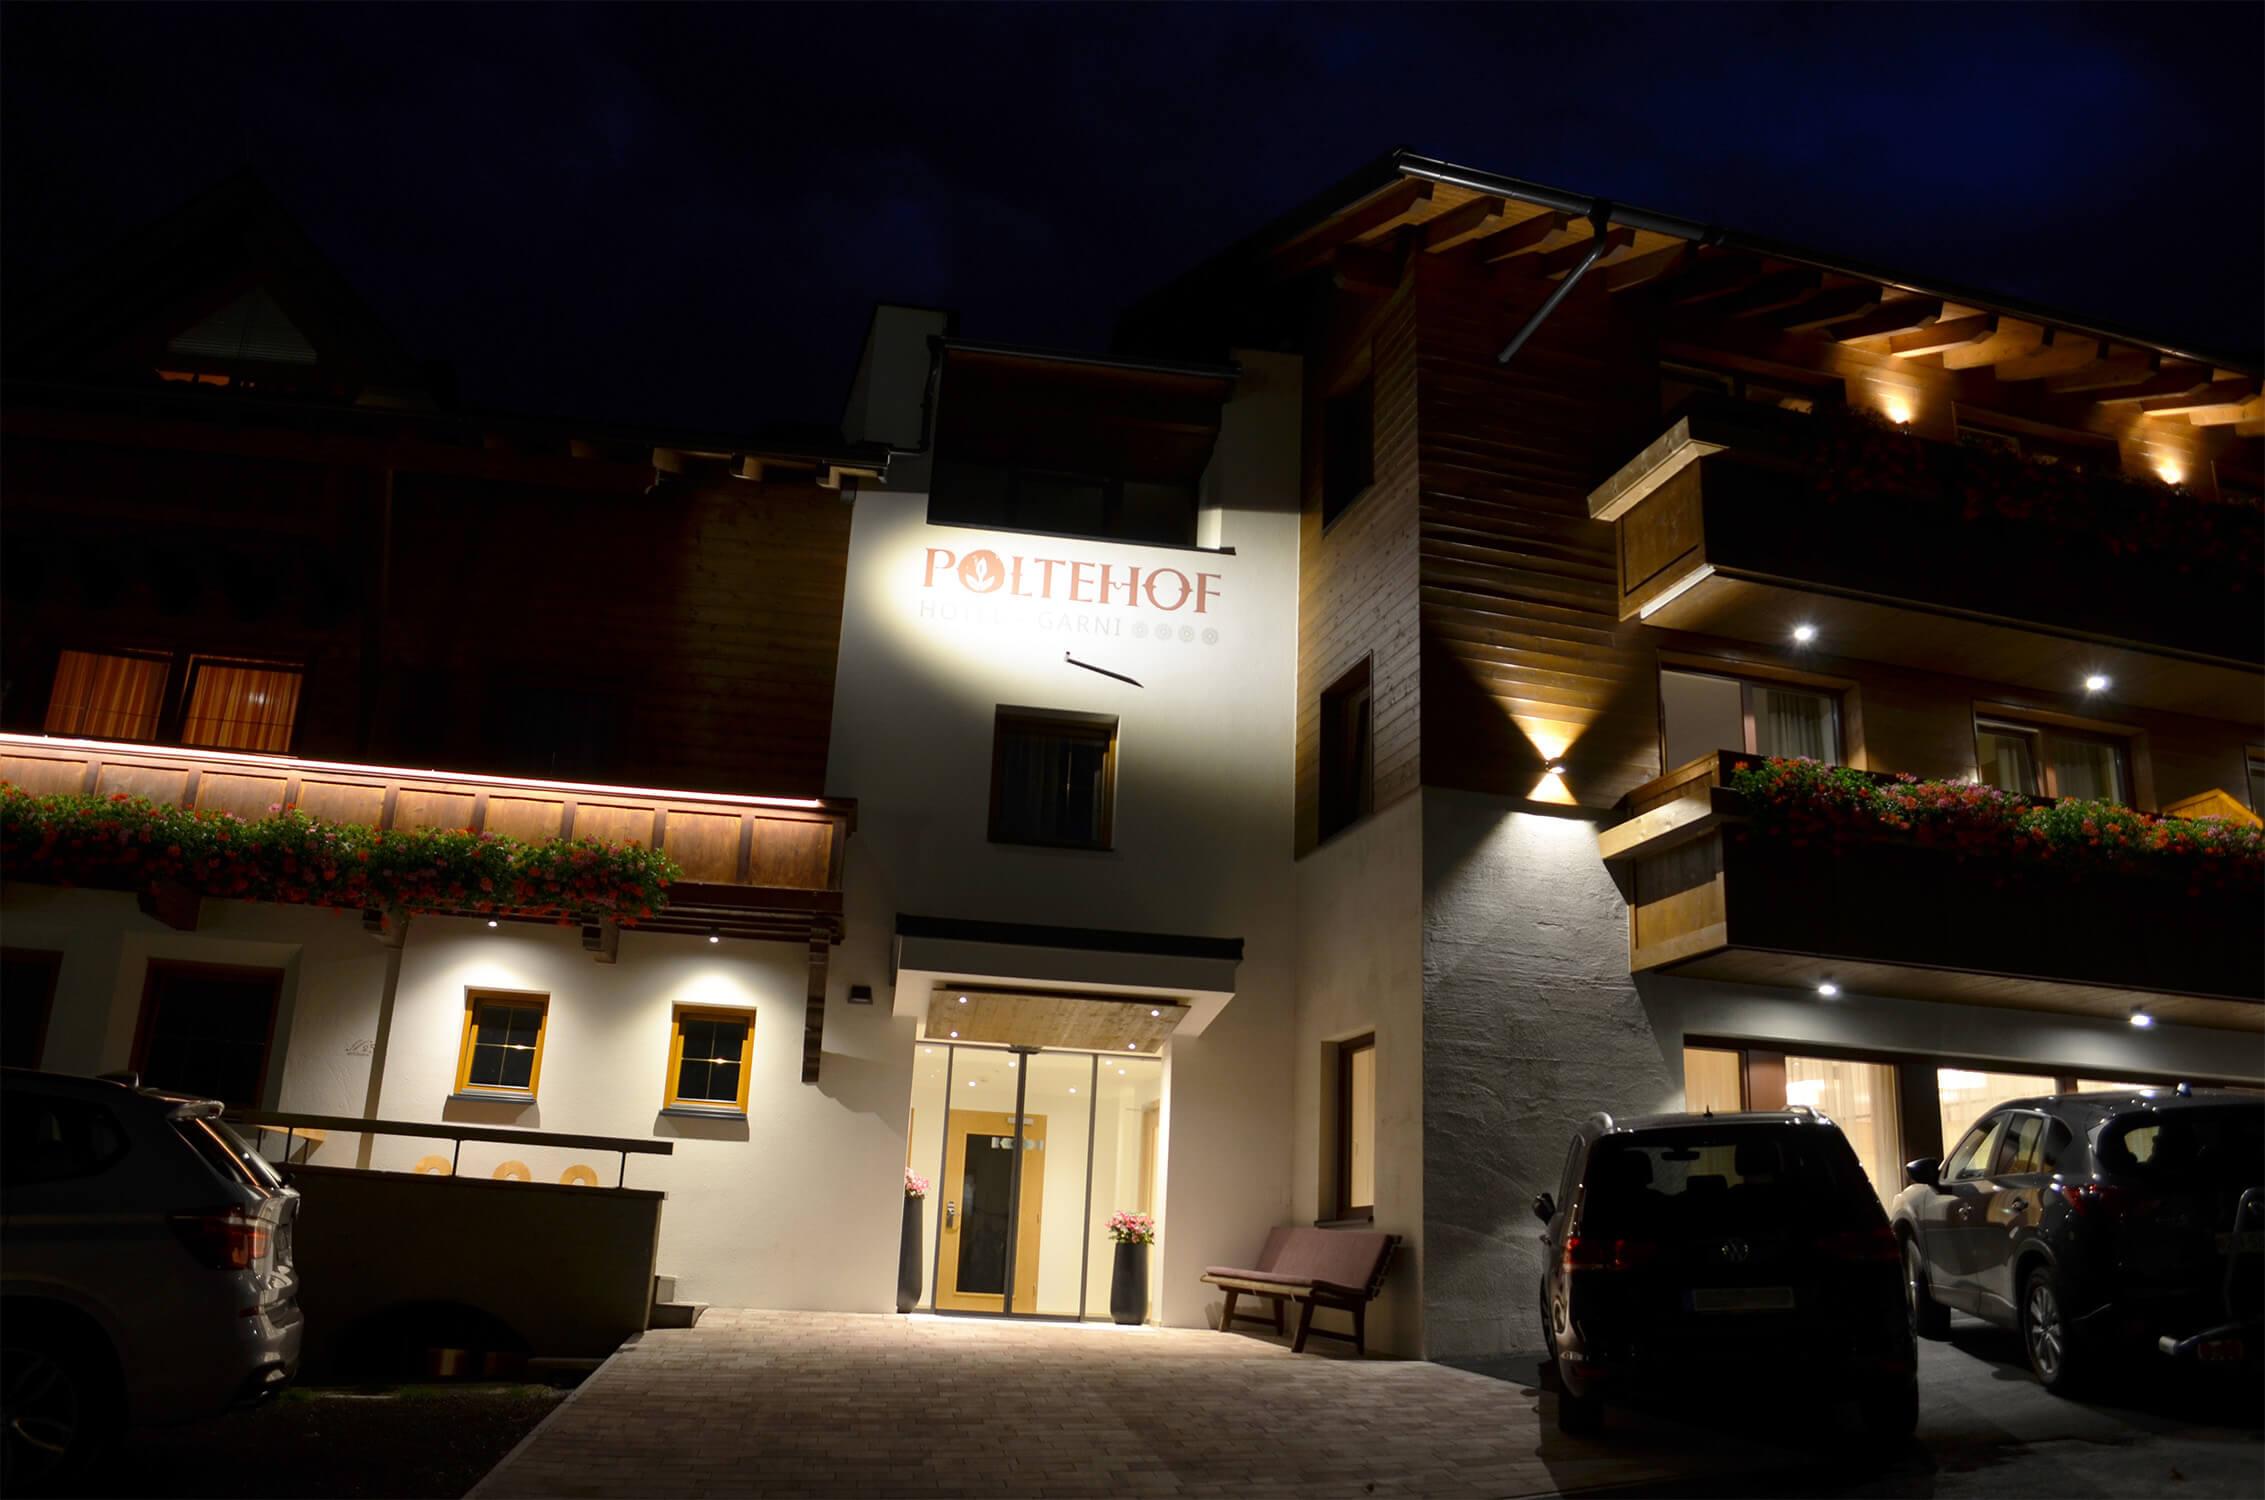 Hotel Garni Hof